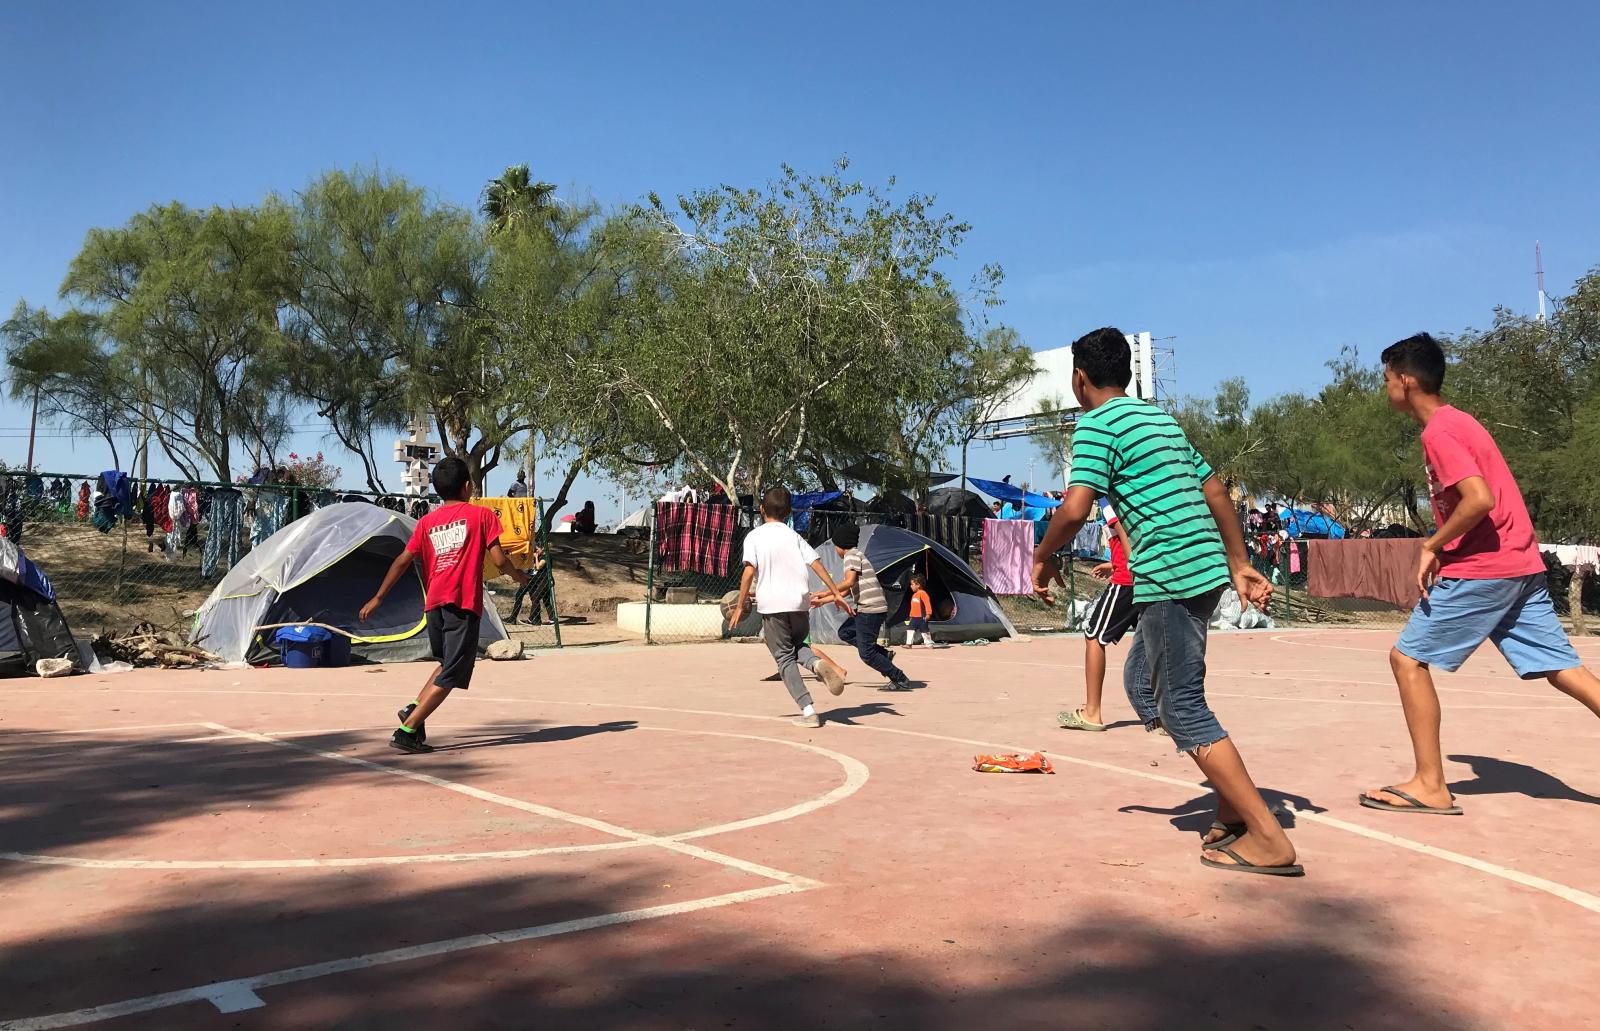 Zabawa dzieci w Meksyku fot. EPA/Abraham Pineda Jácome